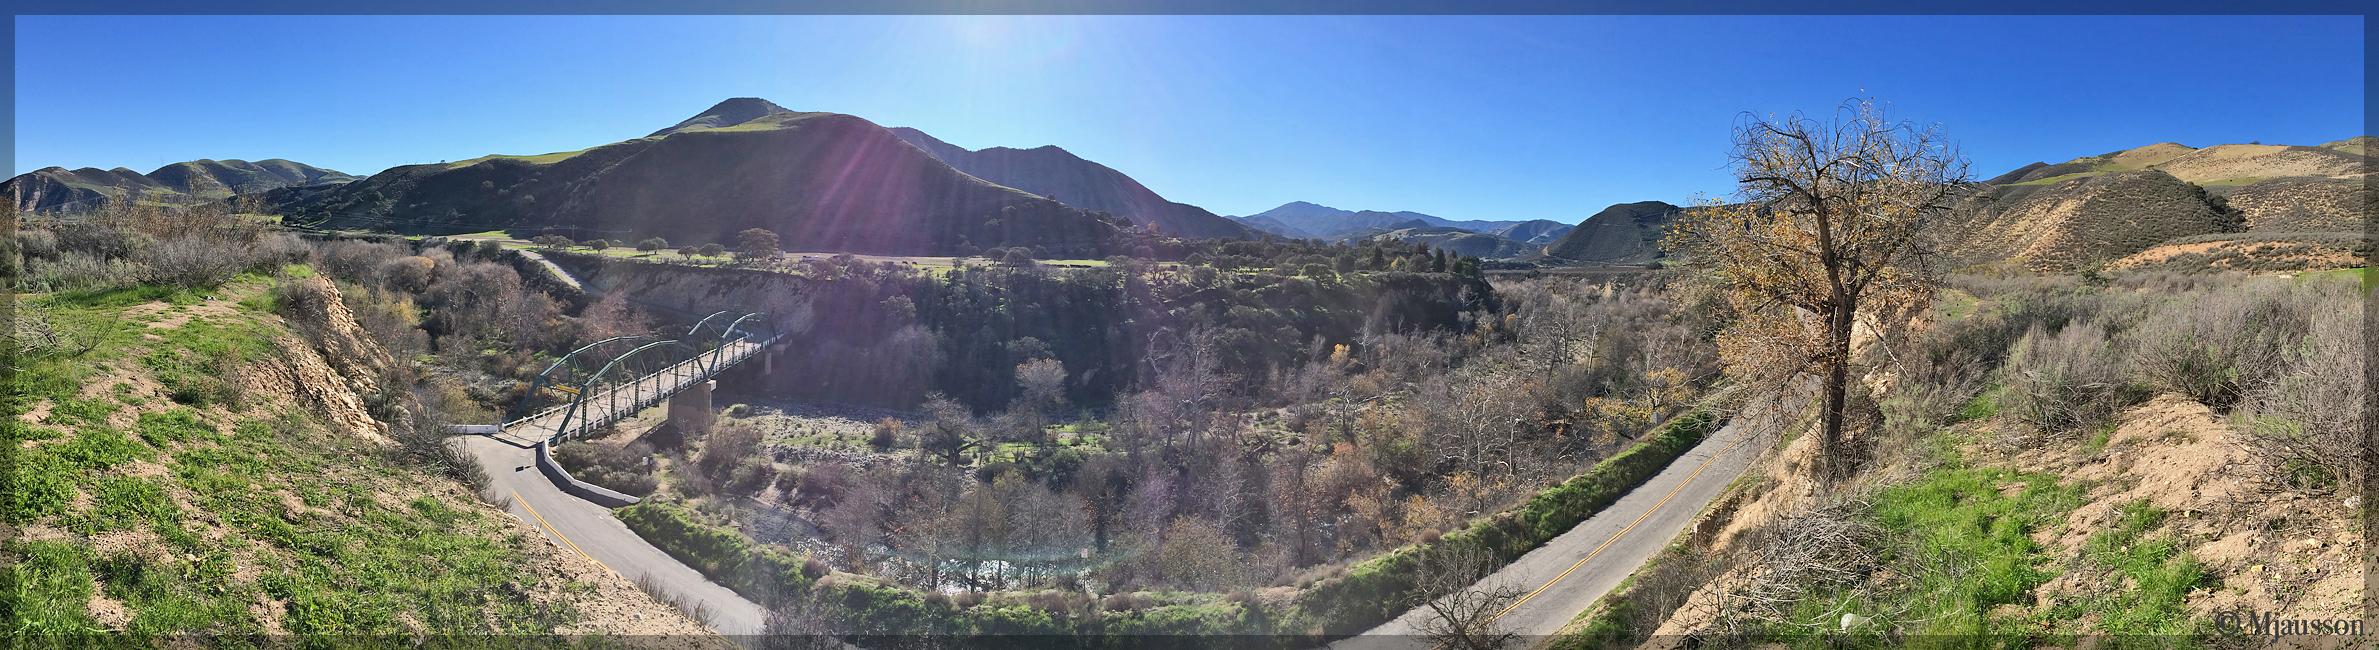 Arroyo Seco Panorama